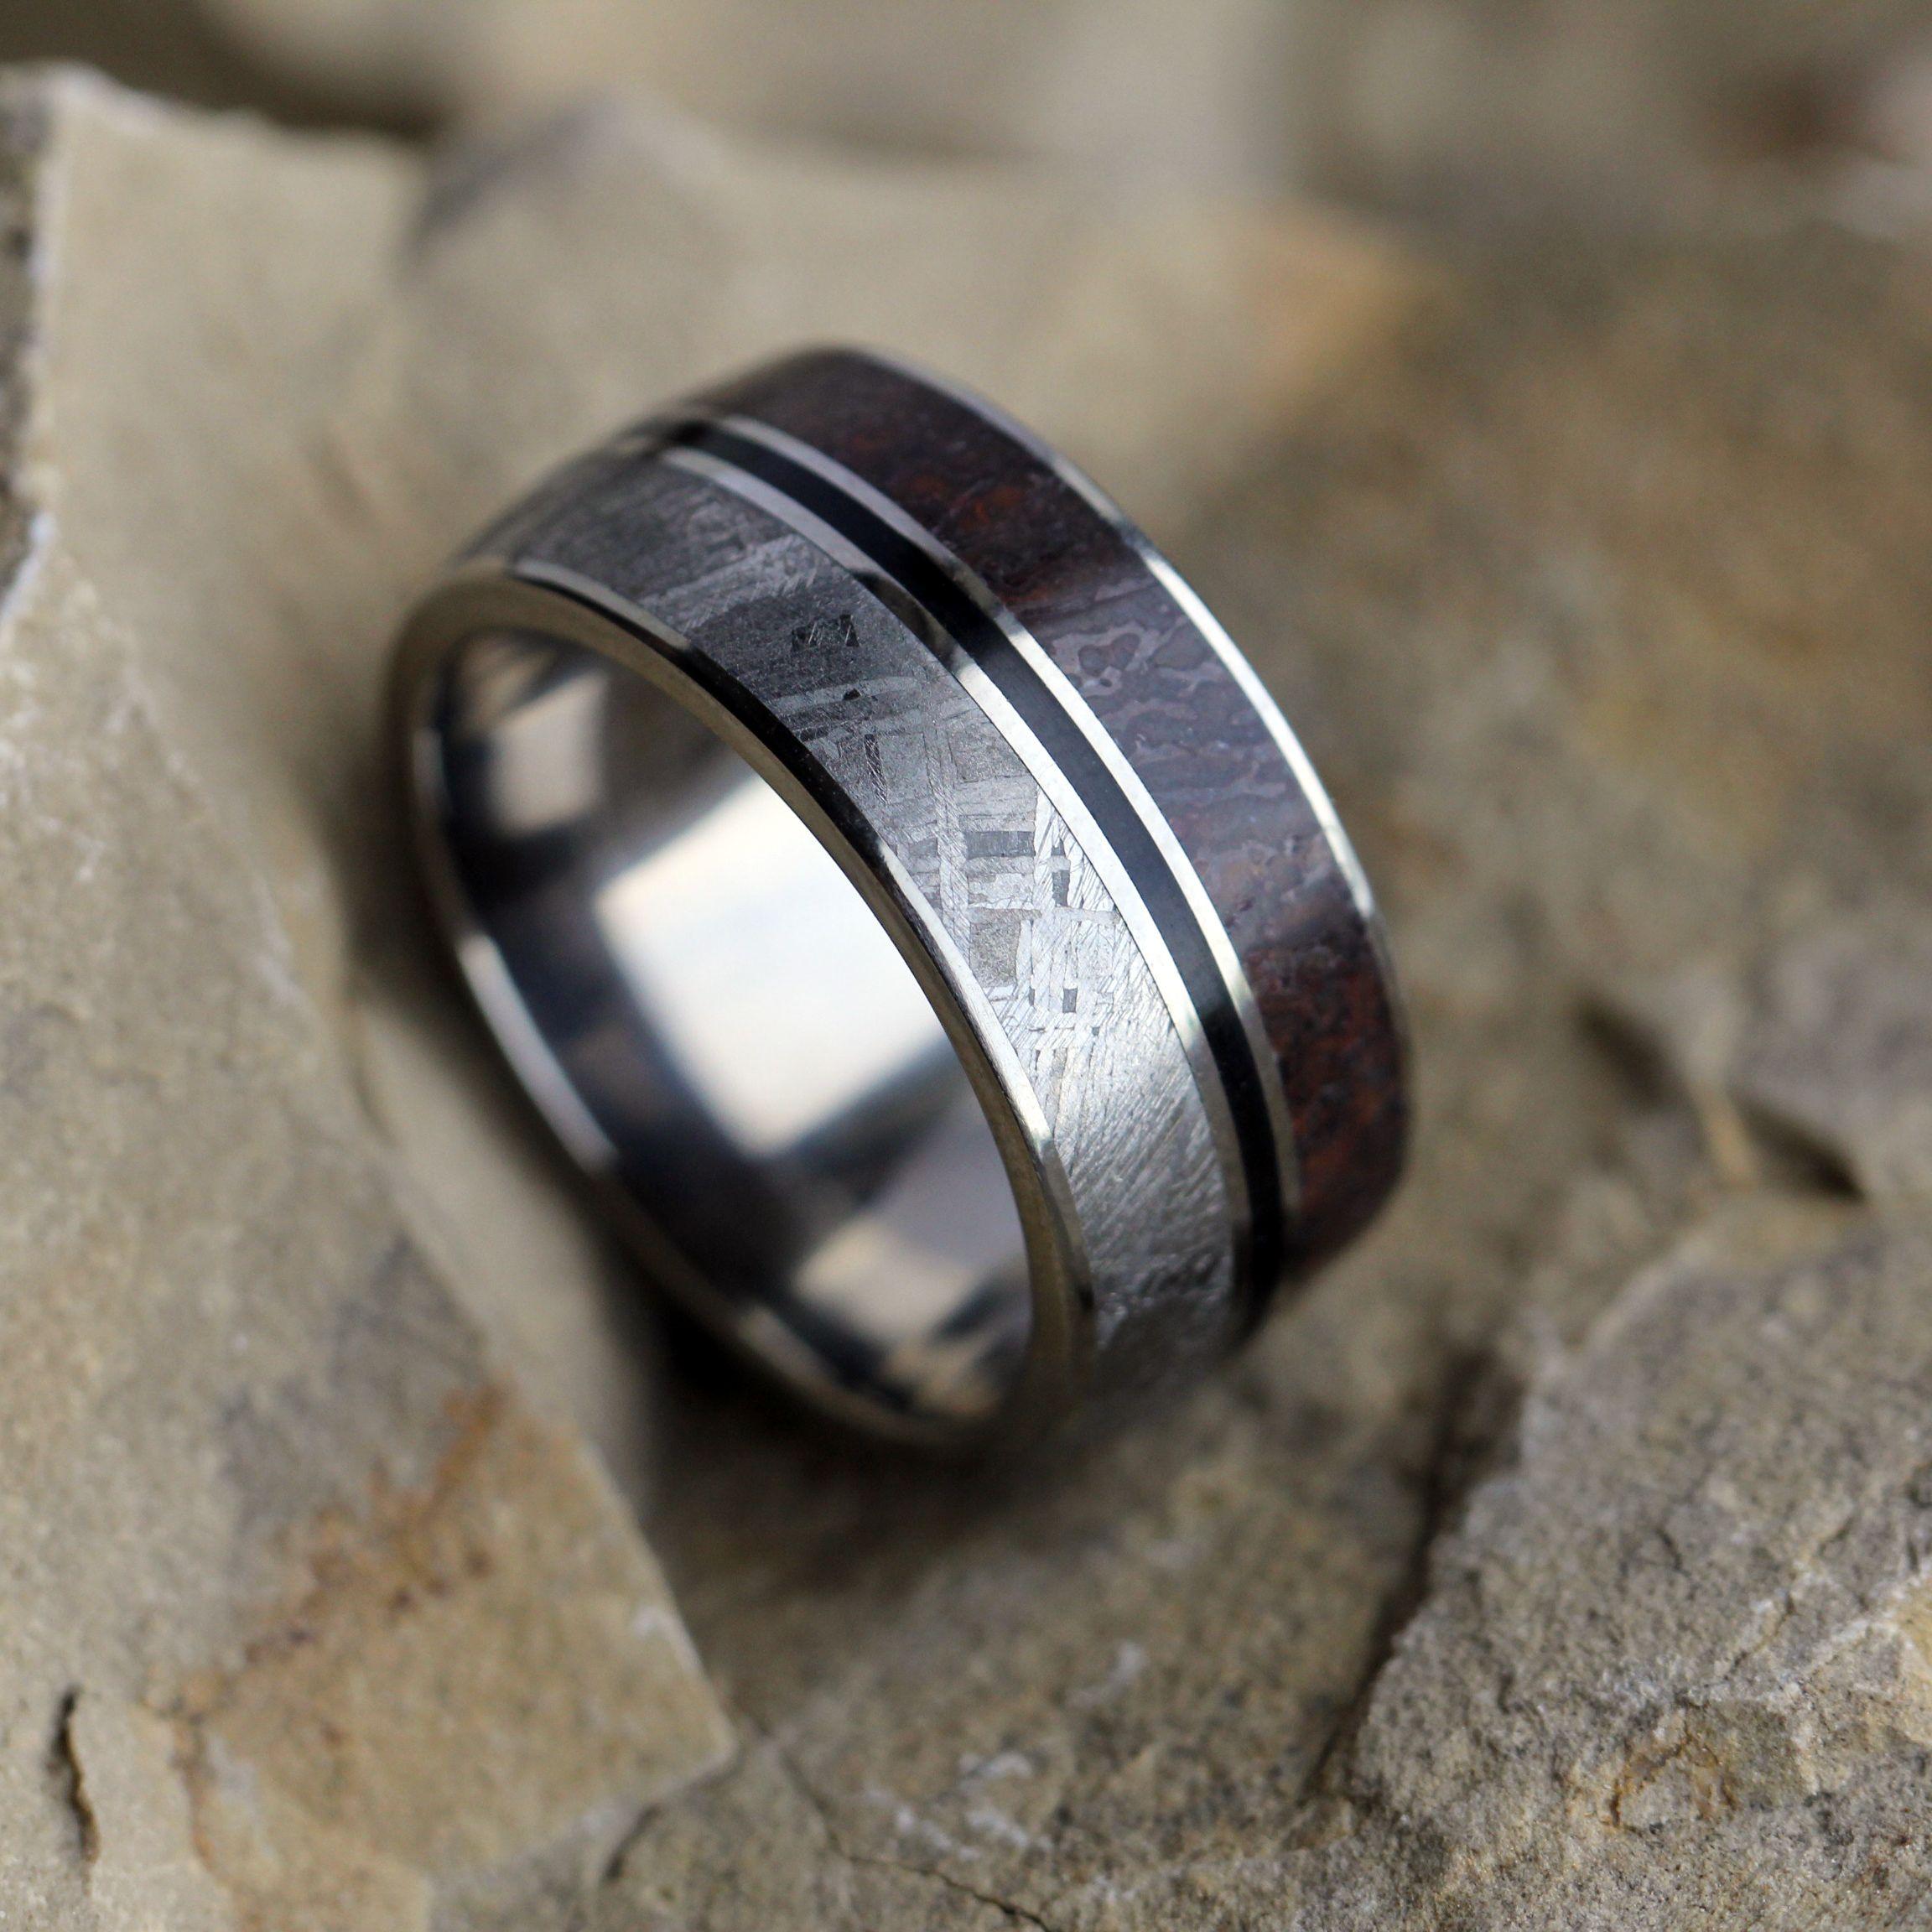 Meteorite, Enamel And Dinosaur Bone Wedding Ring  Jewelry By Johan